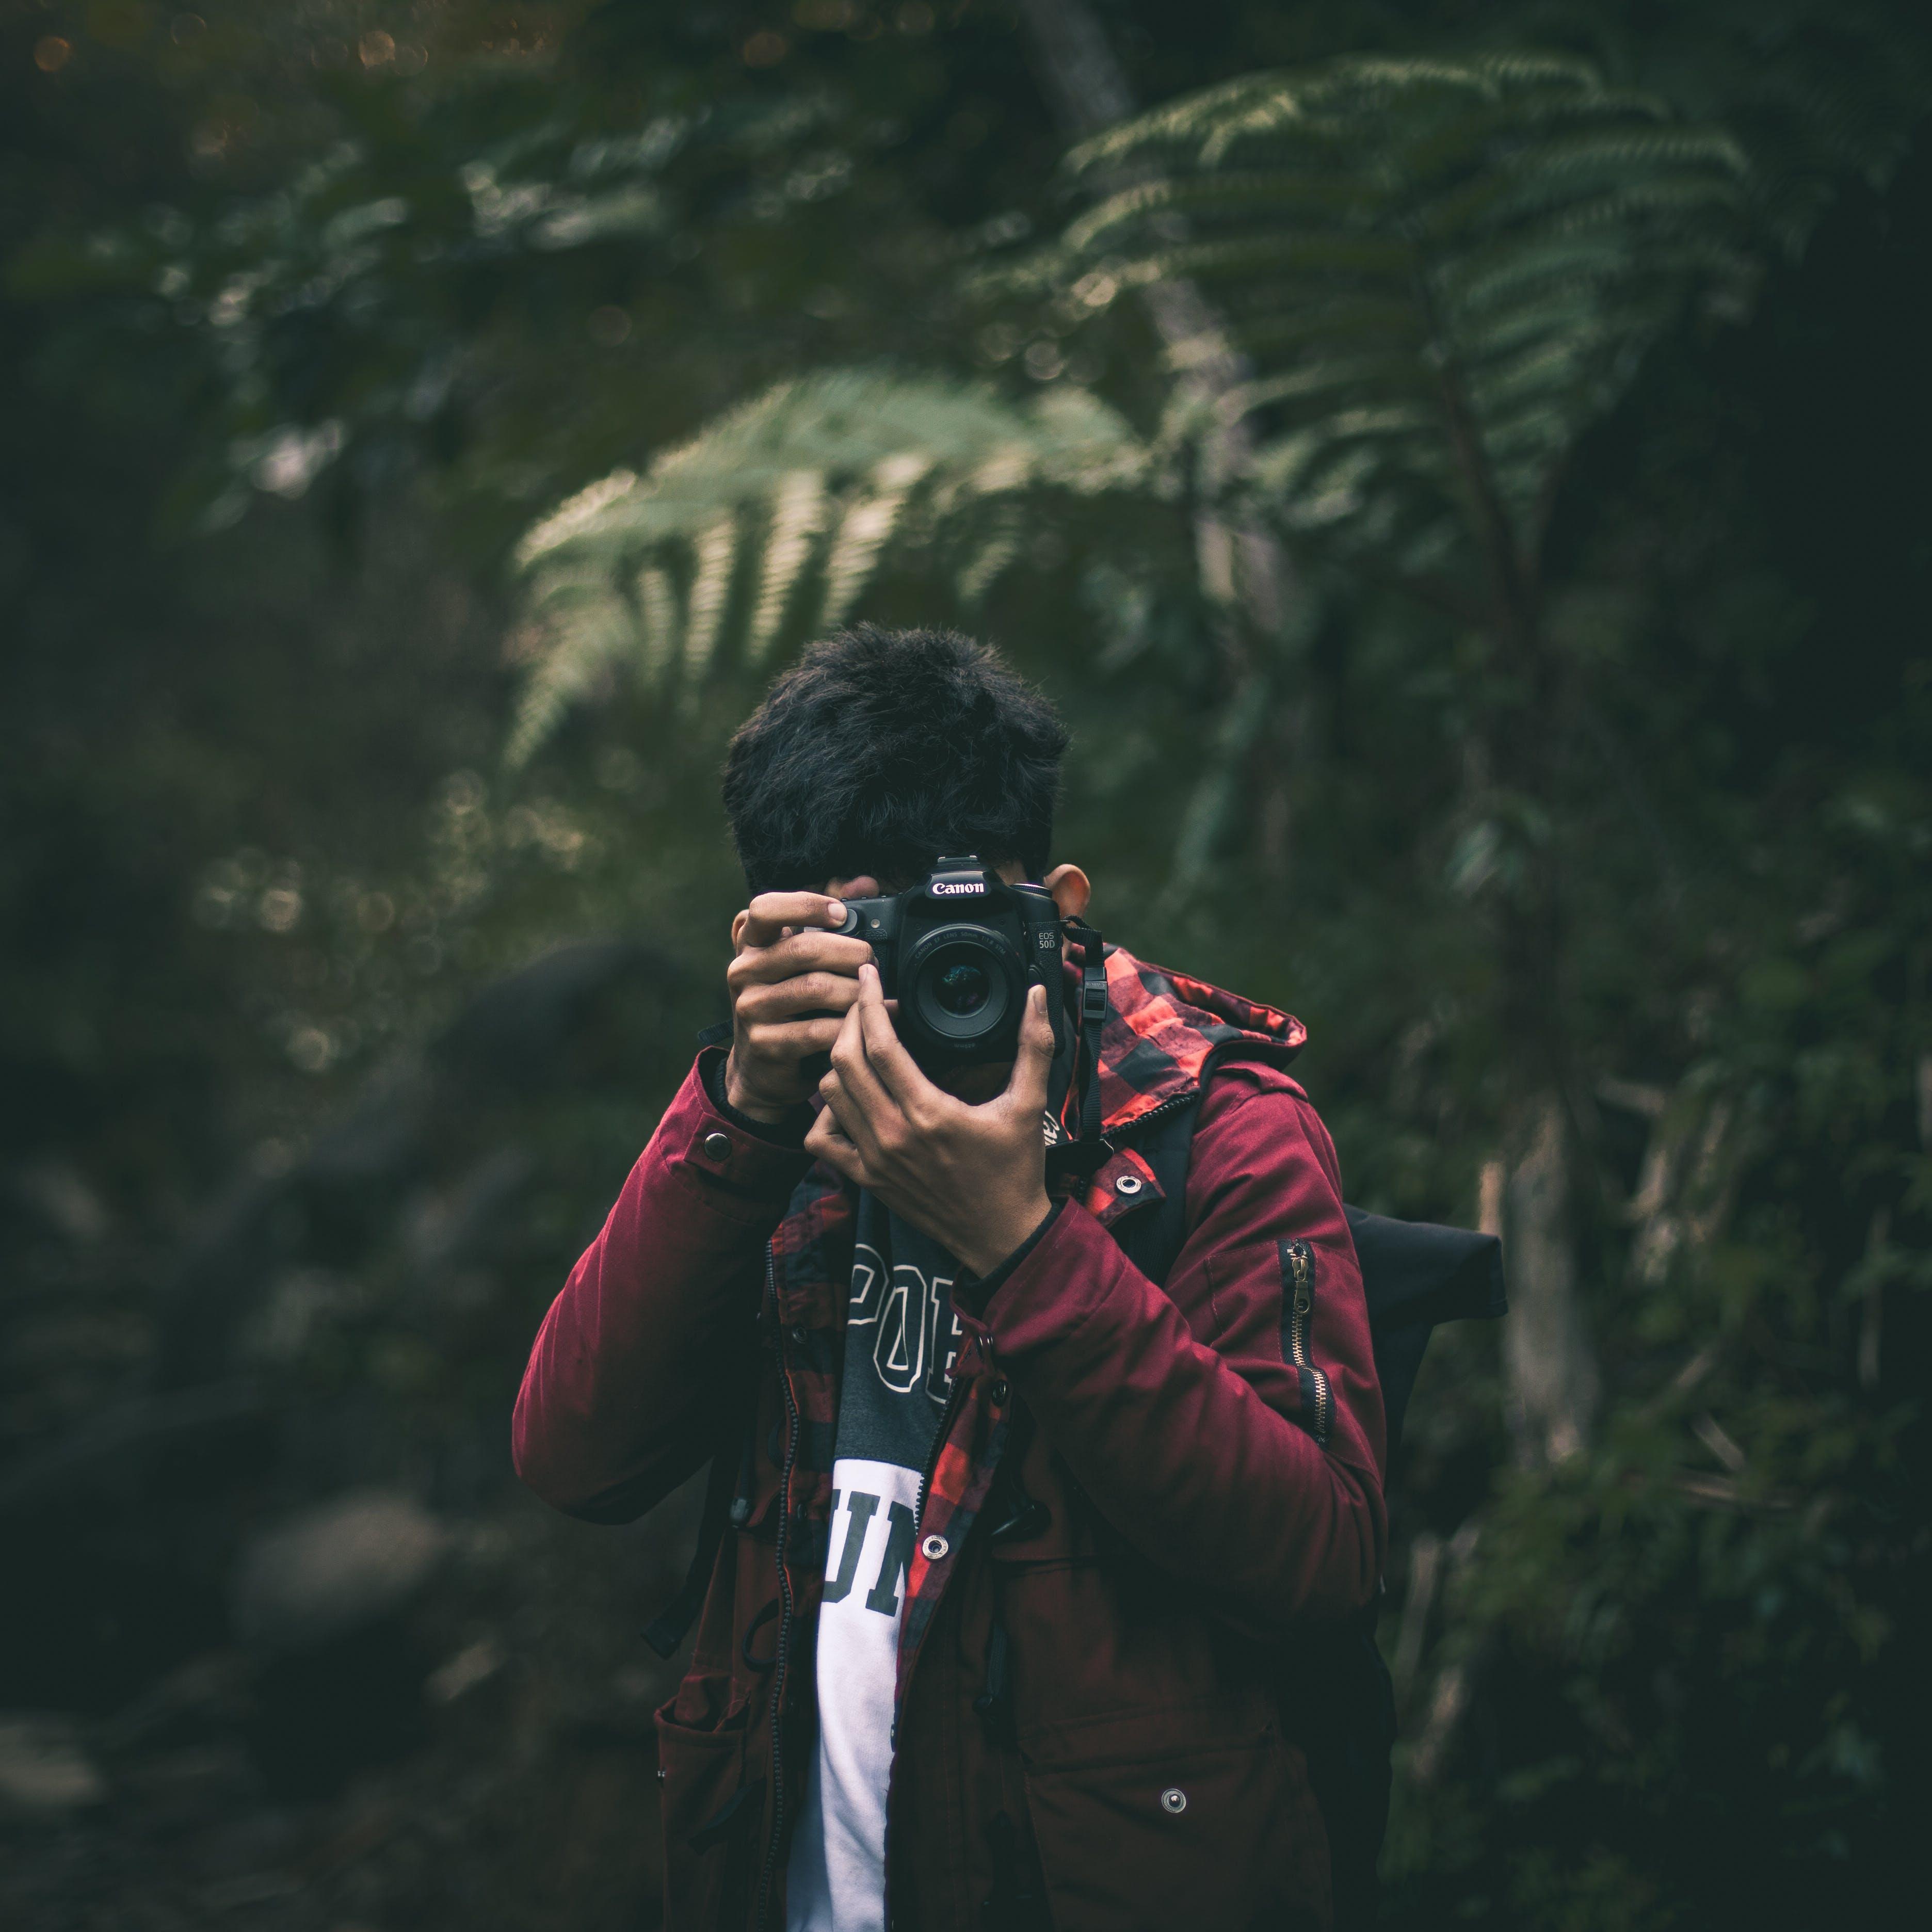 Gratis stockfoto met camera, canon, concentratie, dslr